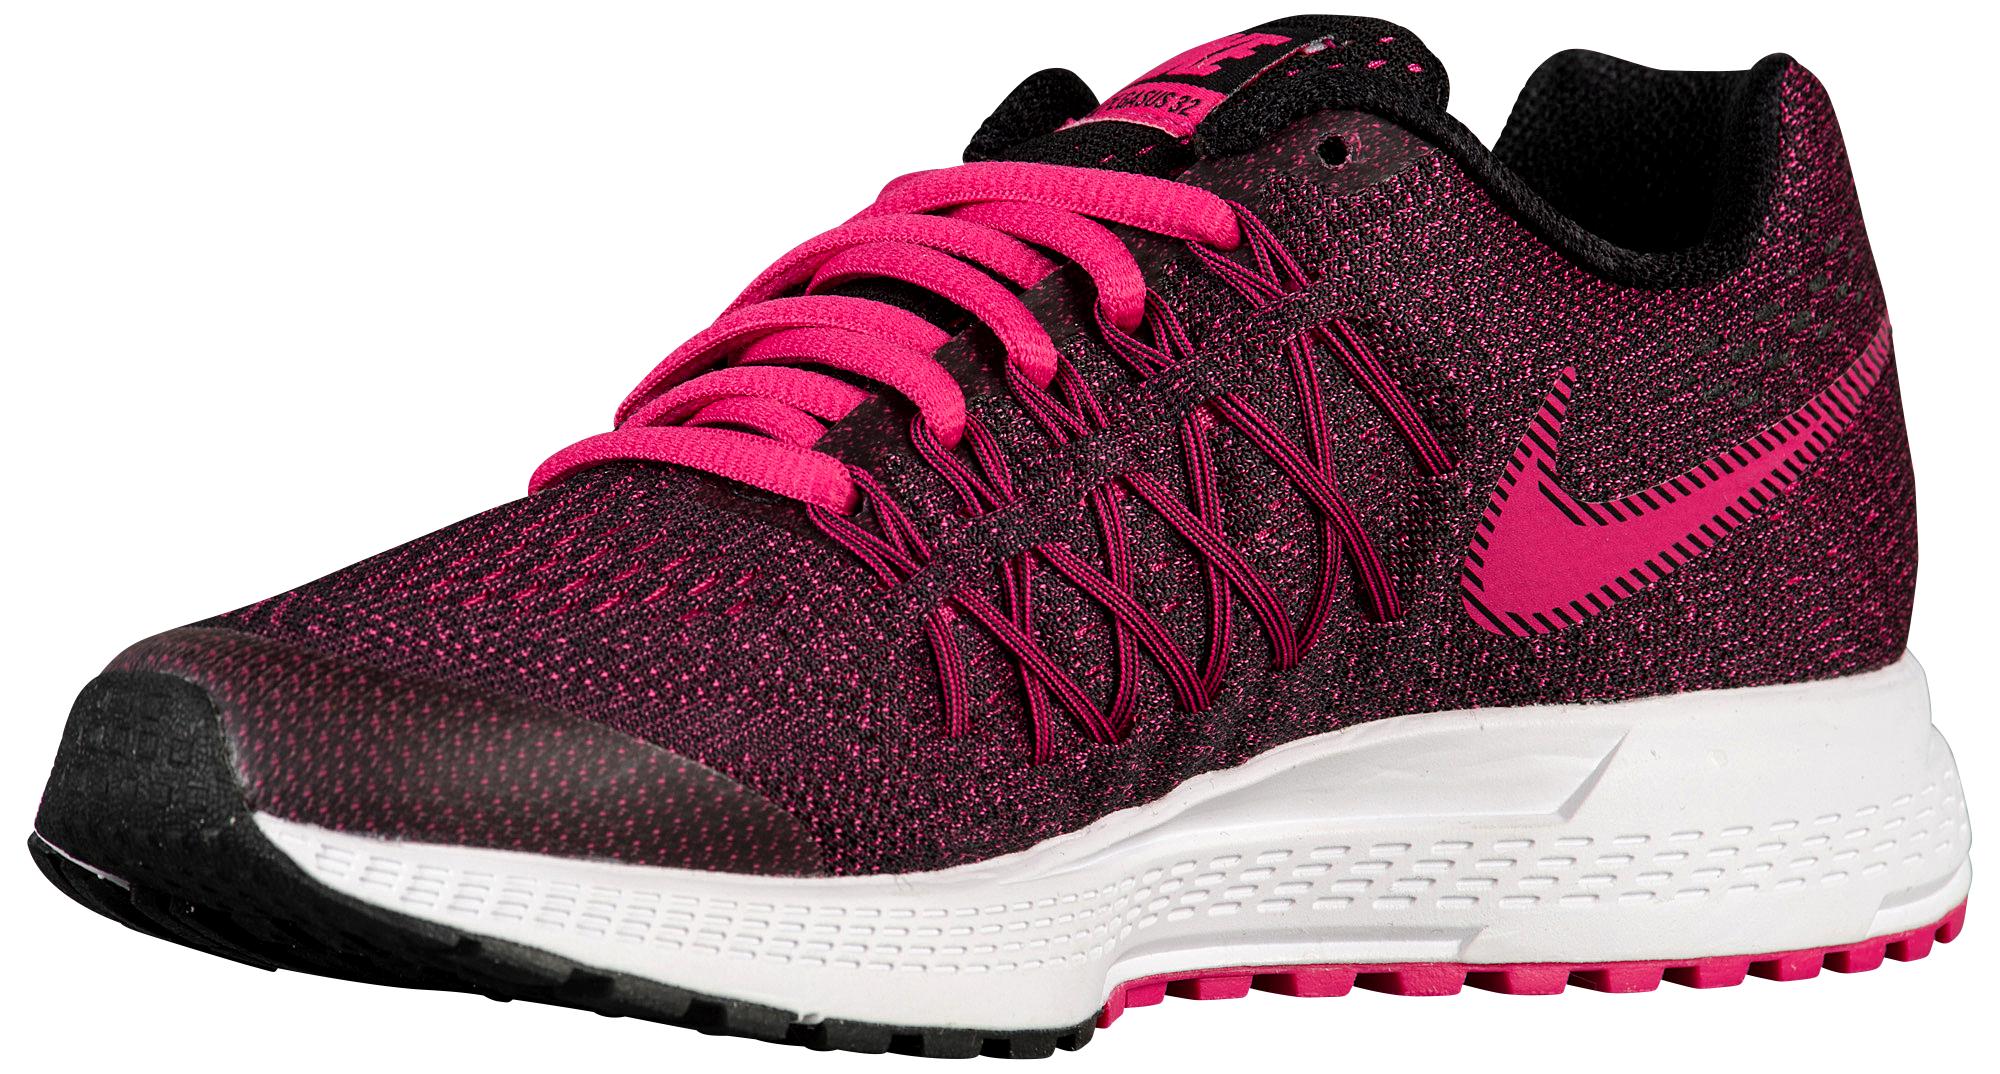 8895d22a71 Nike Zoom Pegasus 32 - Girls' Grade School | Kids Foot Locker